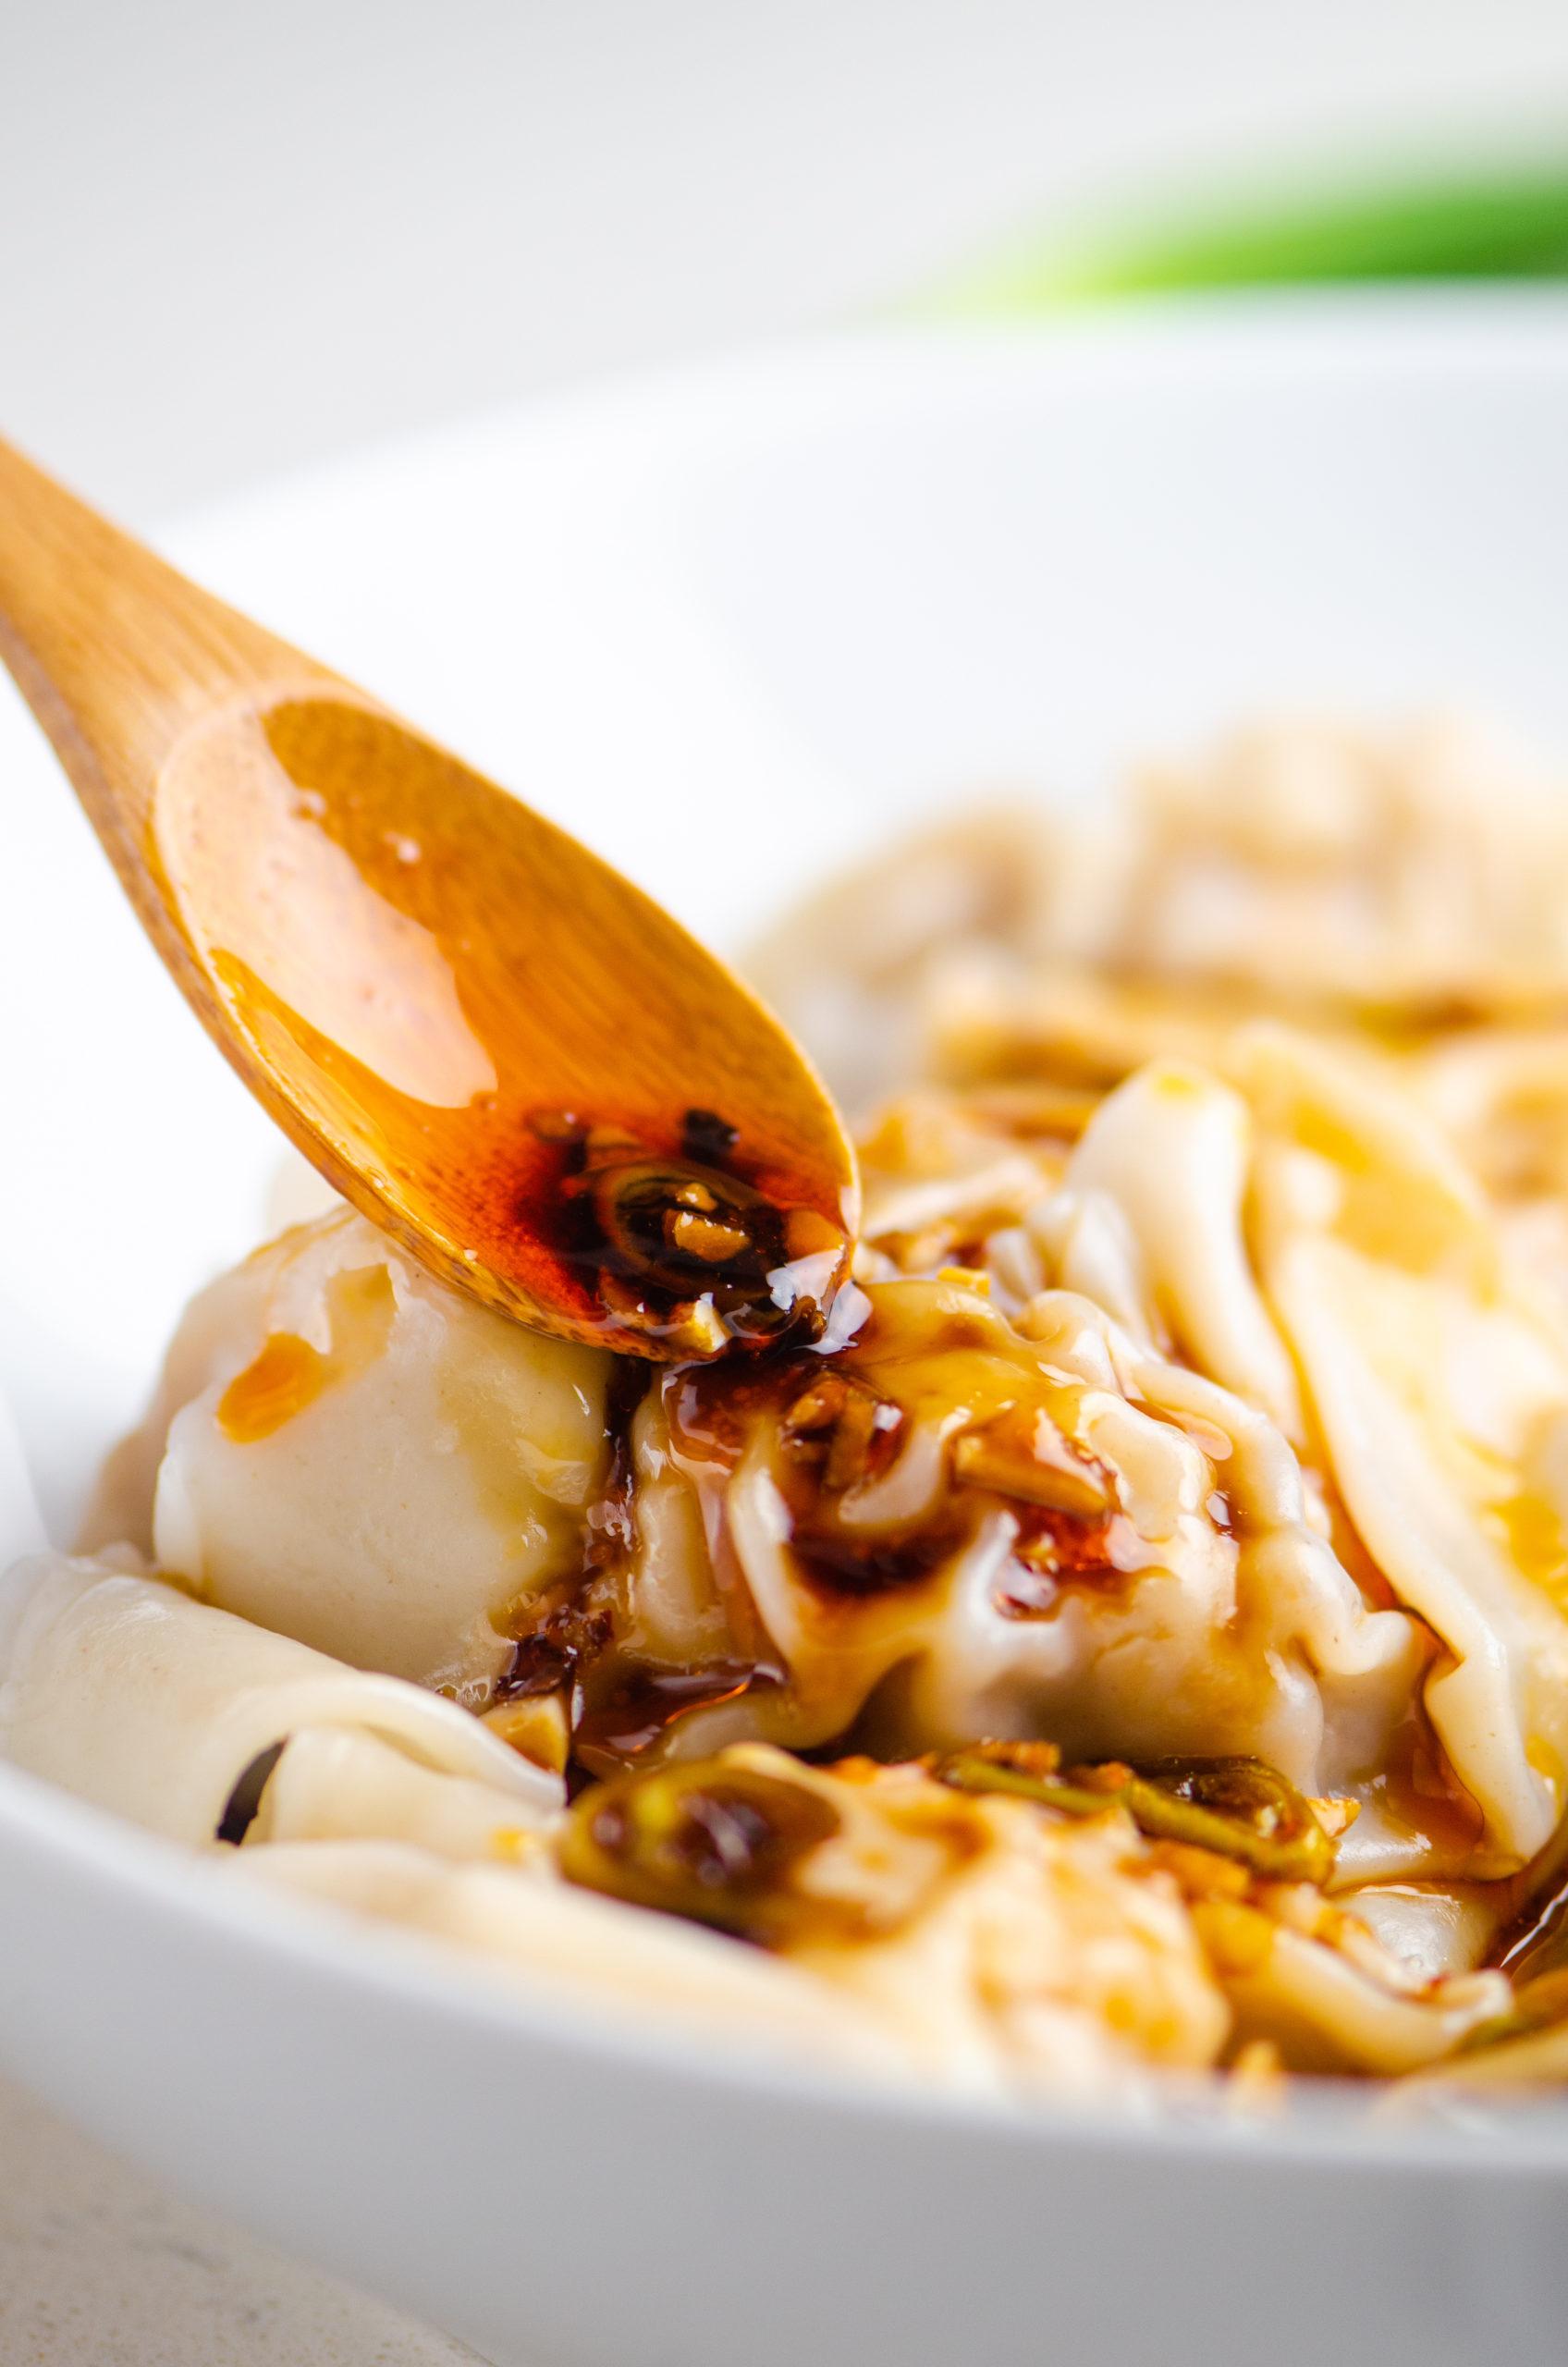 Spooning spicy sauce over the top of dumplings